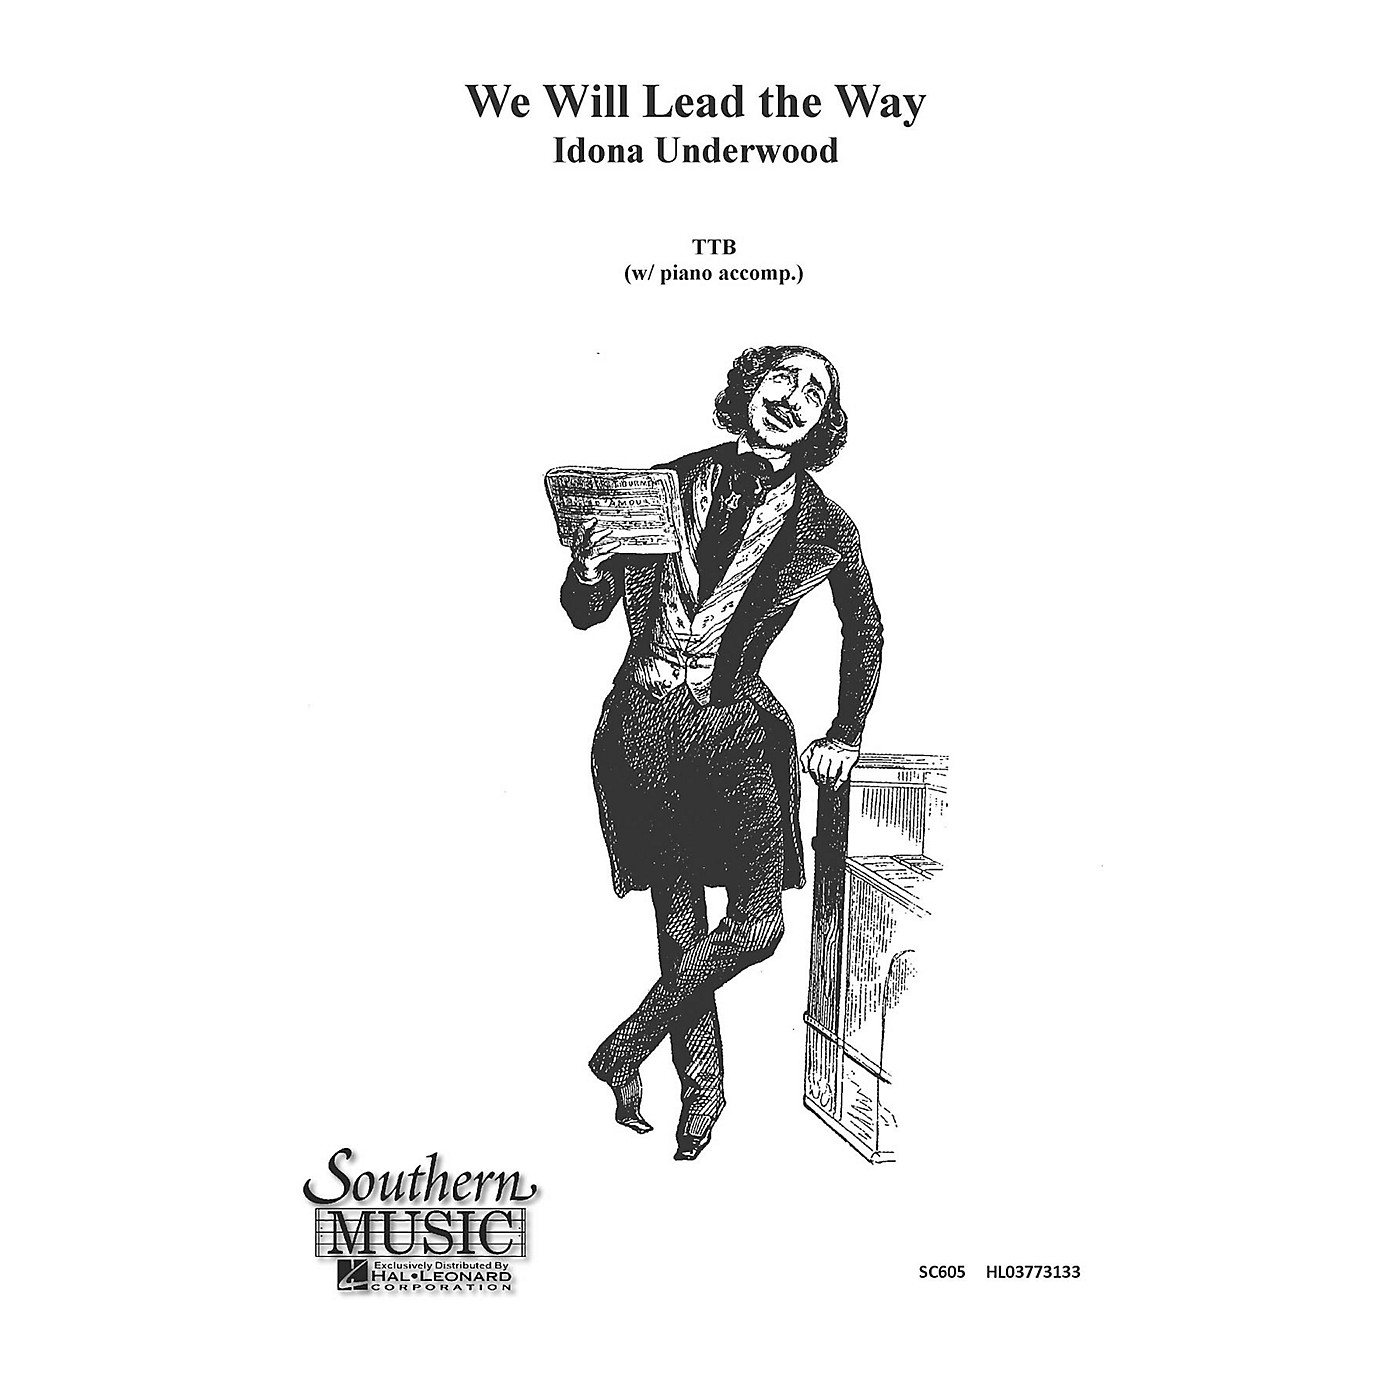 Hal Leonard We Will Lead The Way (Choral Music/Octavo Secular Ttb) TTB Composed by Underwood, Idona thumbnail